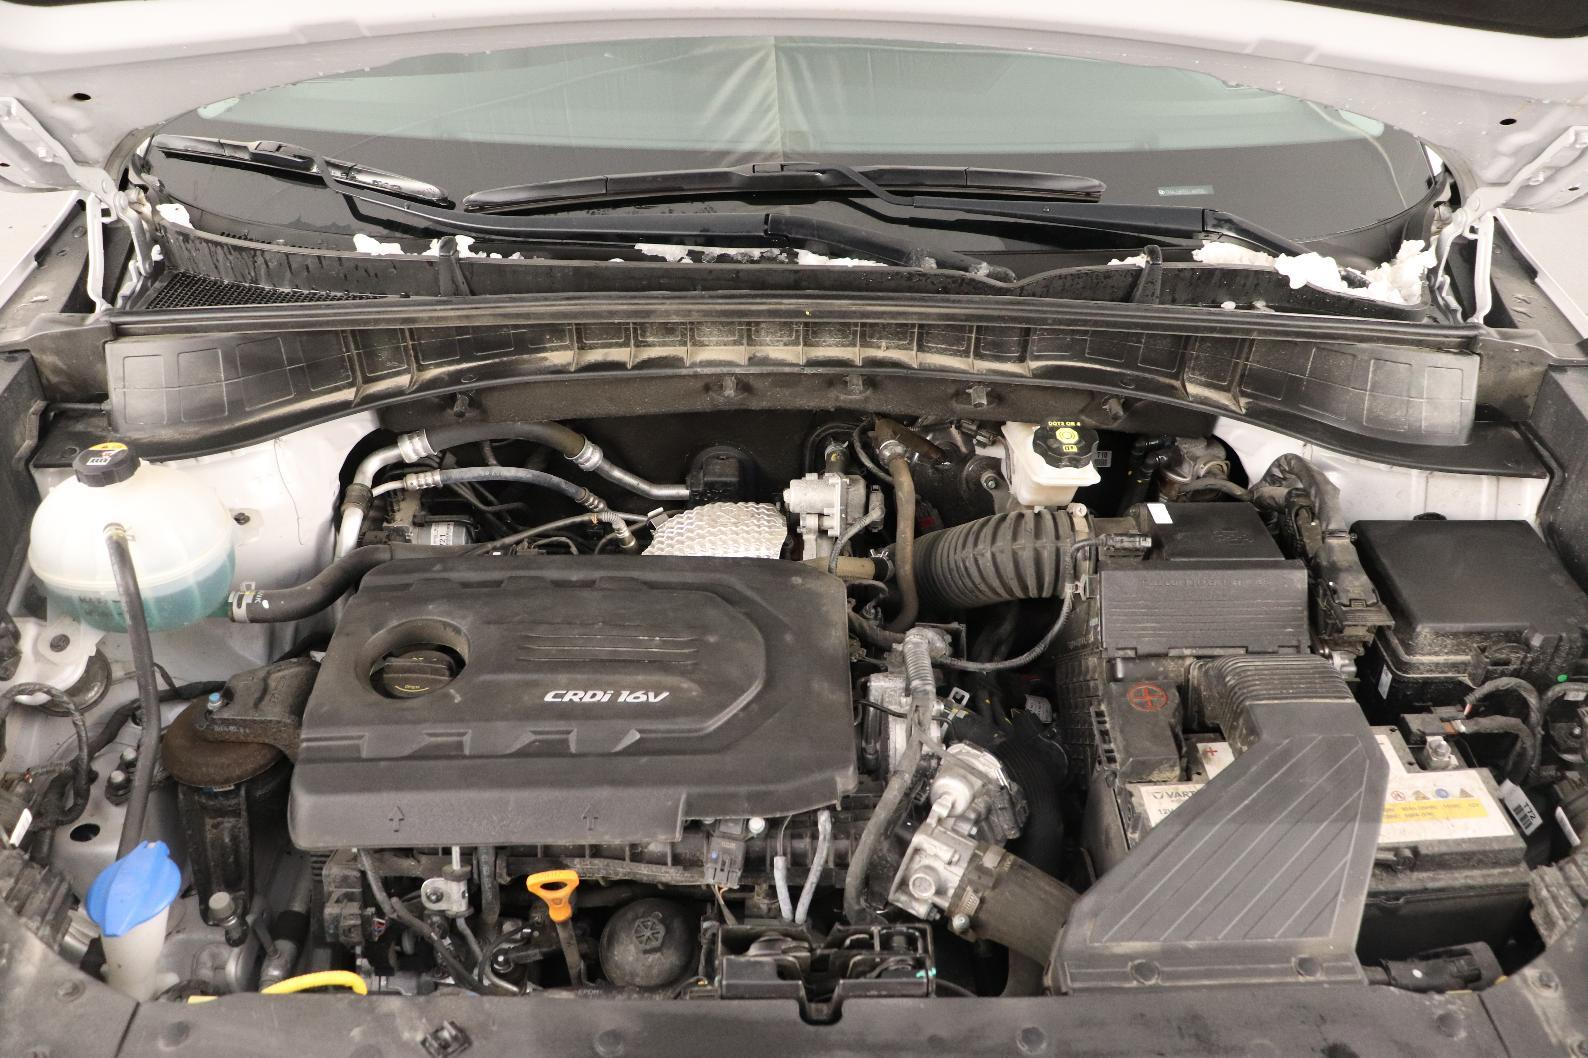 HYUNDAI TUCSON 1.7 CRDi 141 2WD DCT-7 Executive